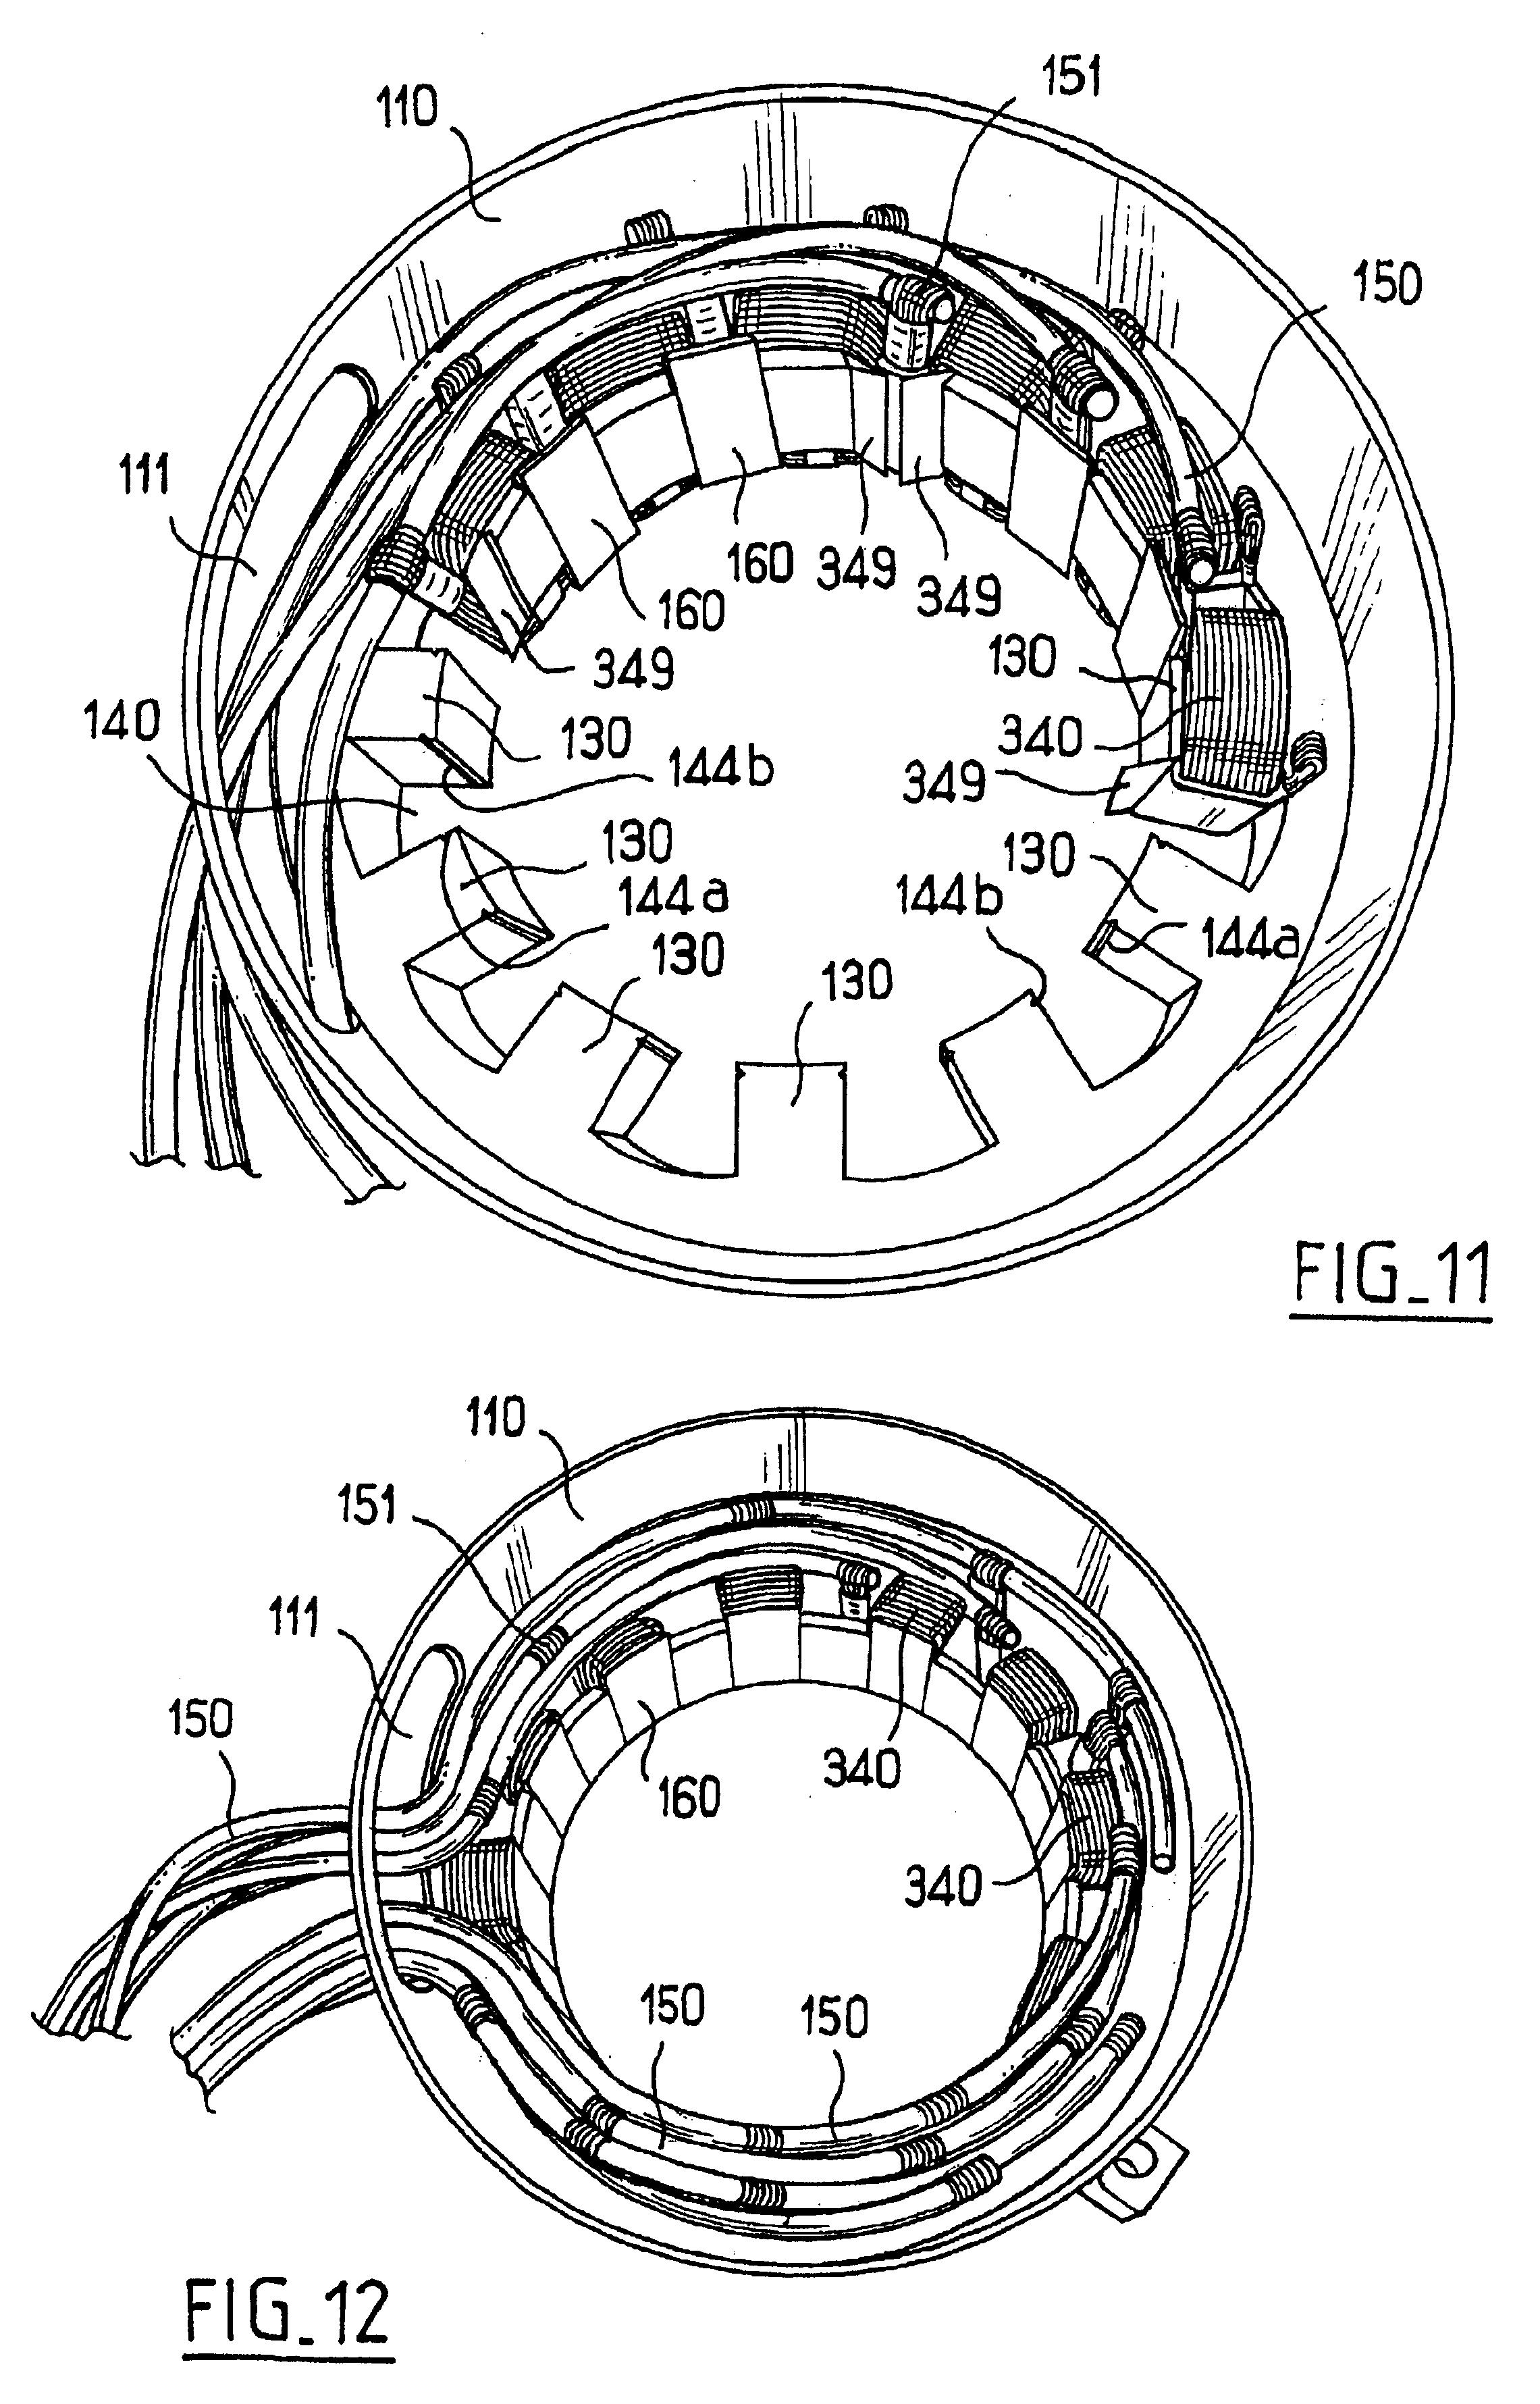 Leroy Somer R438 Voltage Regulator Wiring Diagram free download